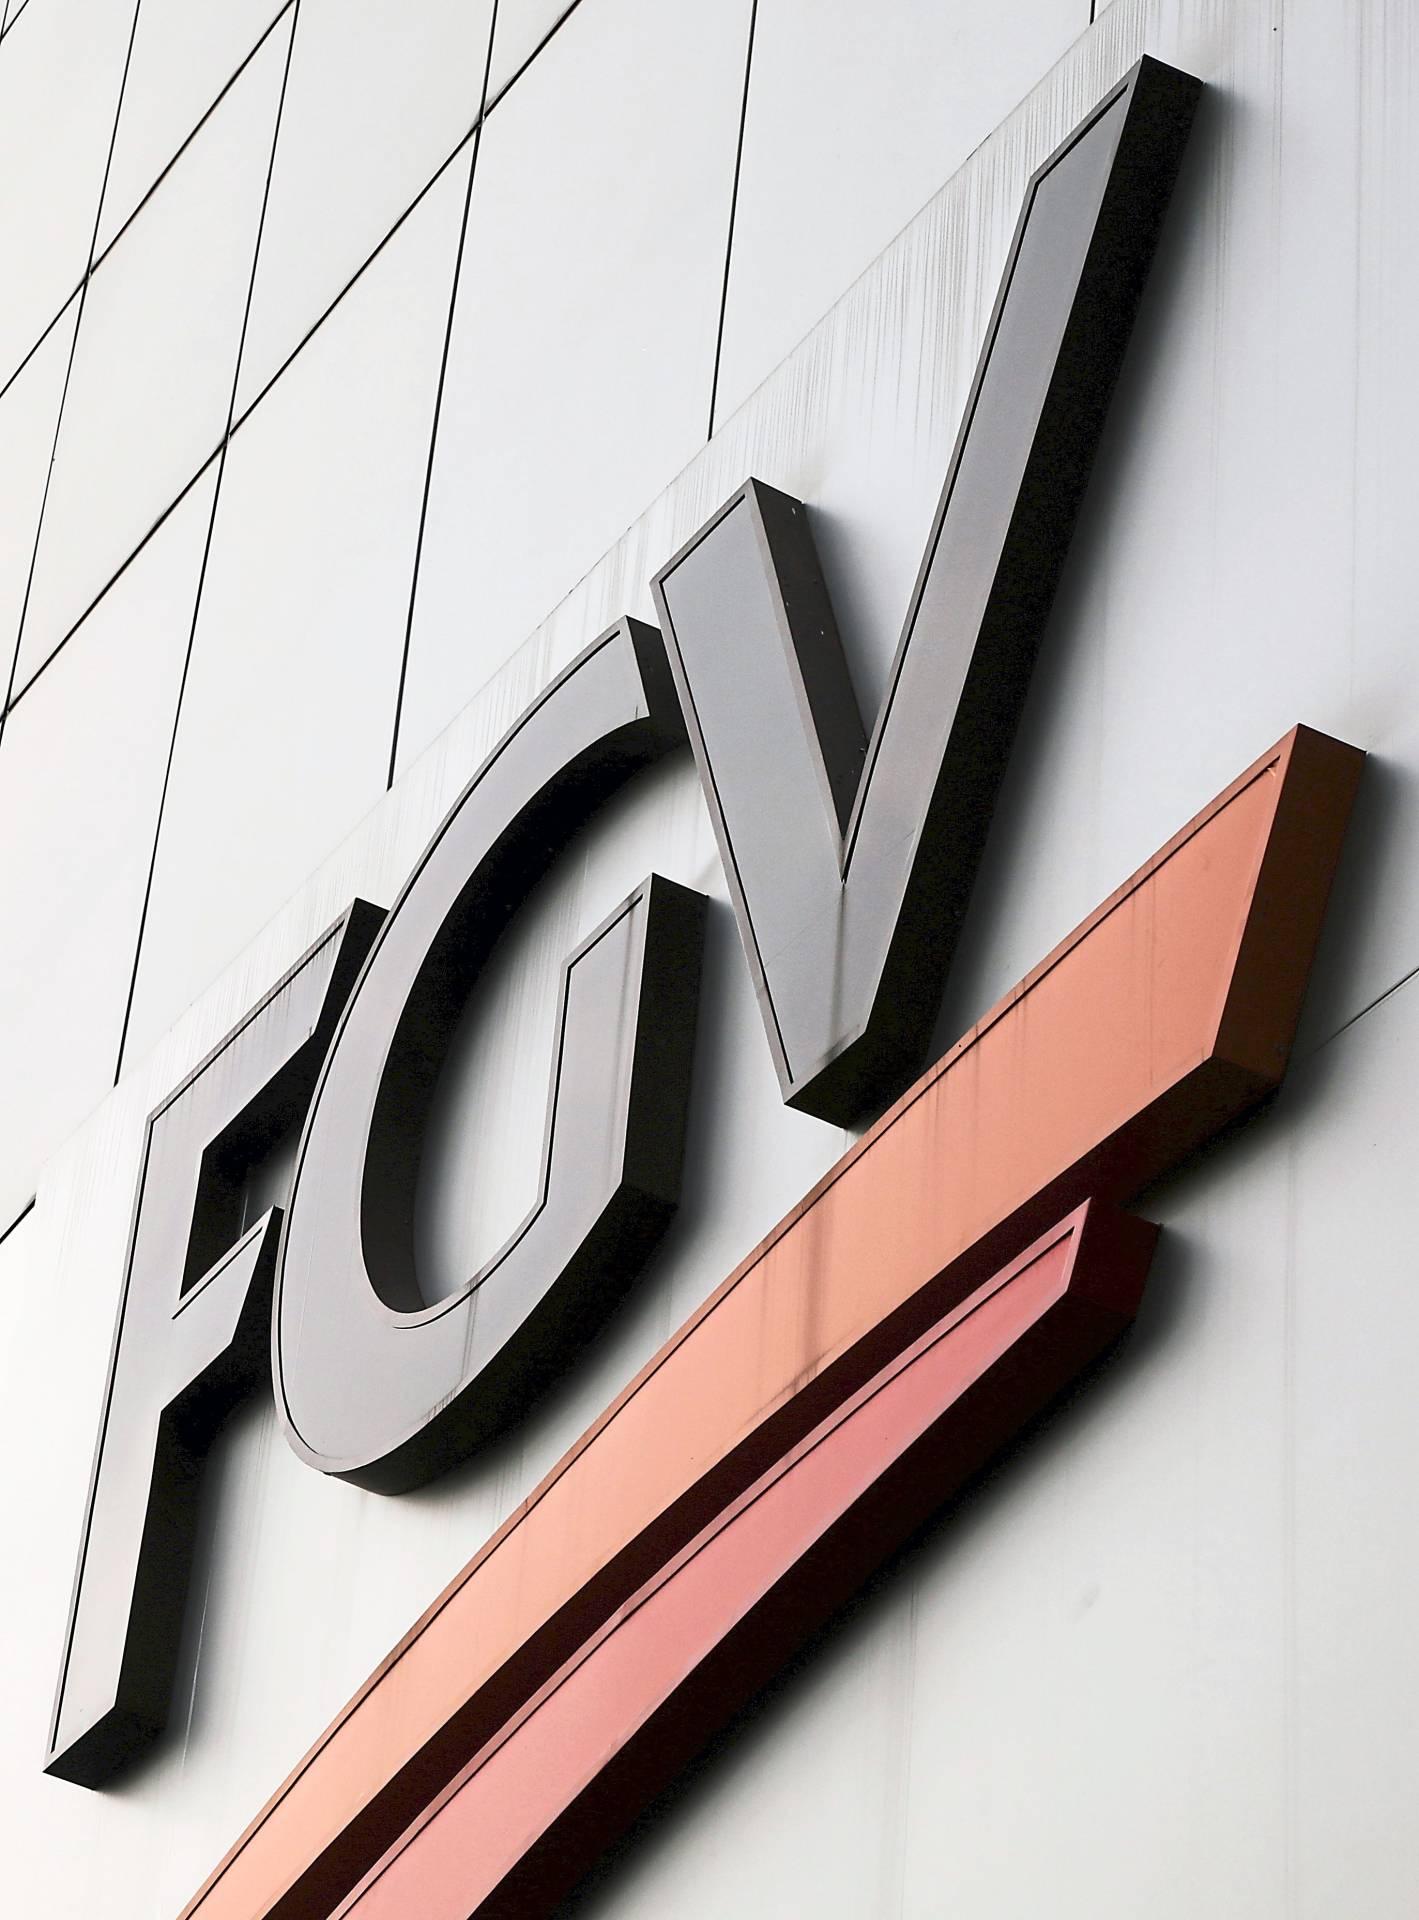 FGV records net profit of RM75.79mil